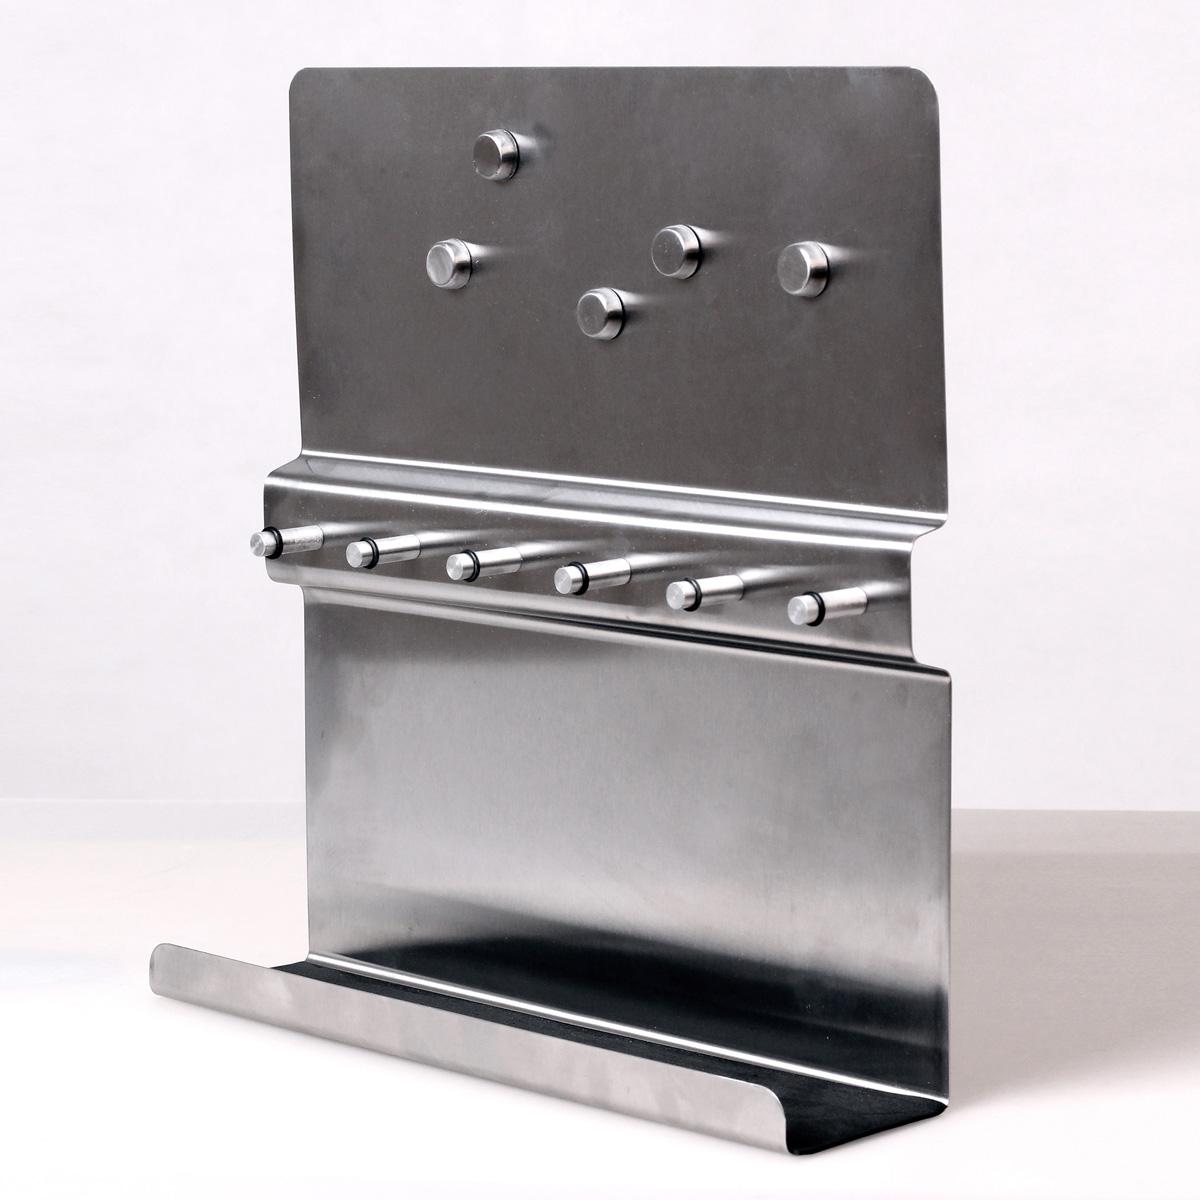 schl ssel brett edelstahl memo magnet bord ablage schl sselboard schl sselkasten ebay. Black Bedroom Furniture Sets. Home Design Ideas